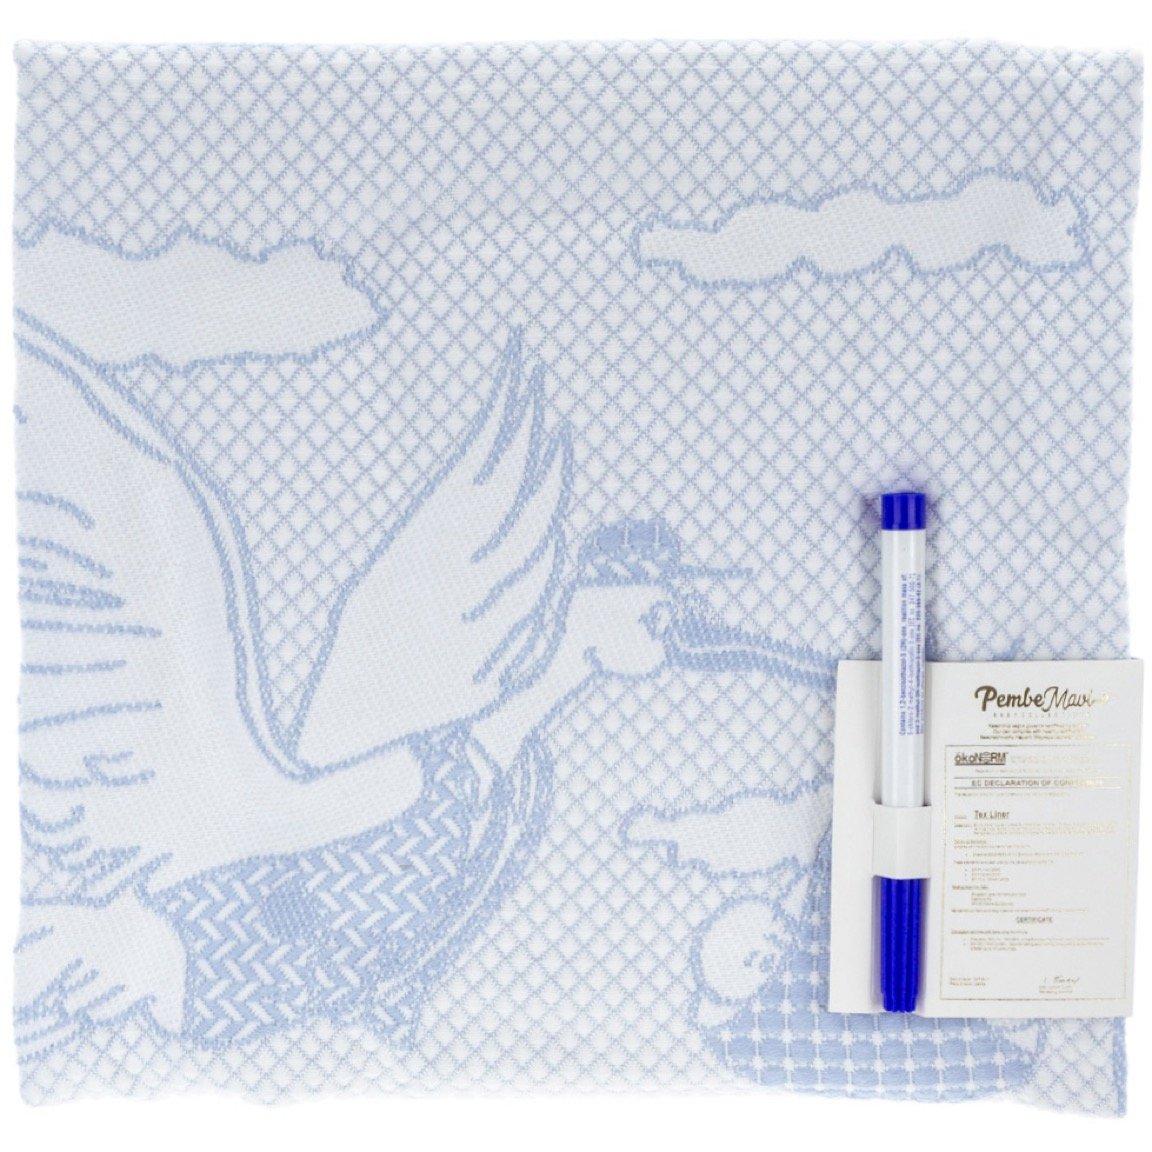 Pembe Mavi εποχιακή κουβέρτα & ανεξίτηλος μαρκαδόρος «Blue Pelican»